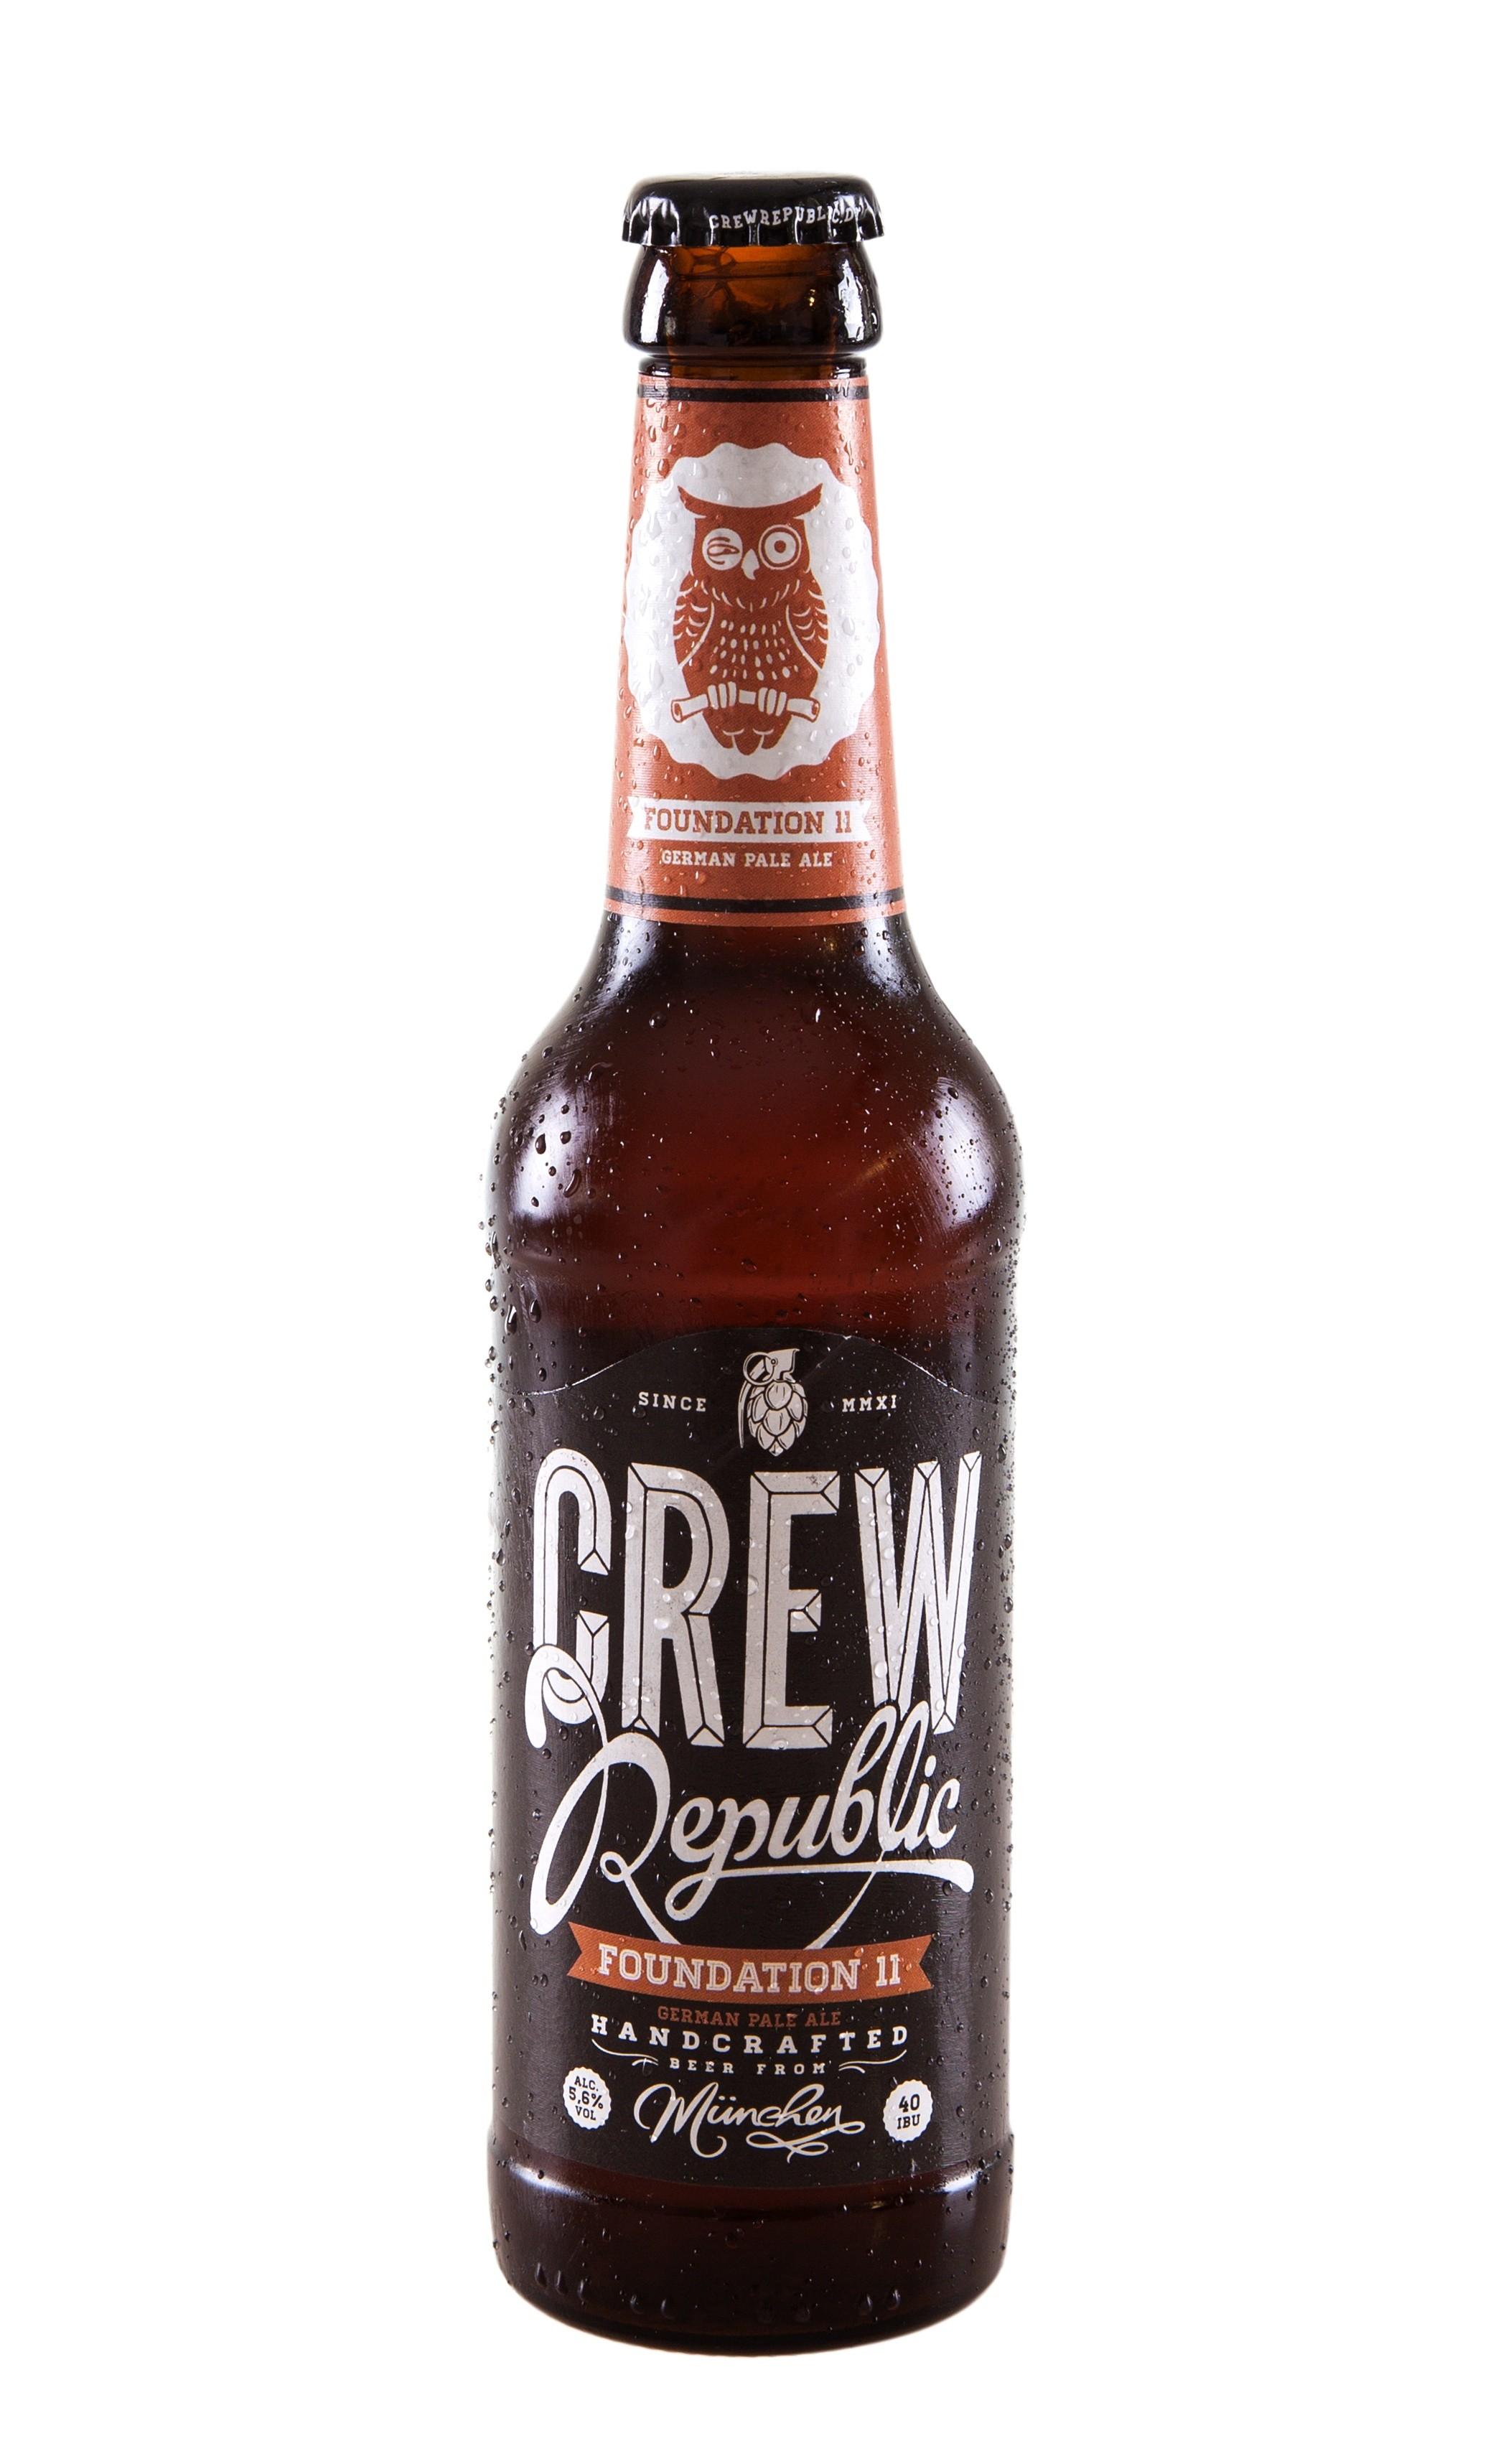 CREW Republic - Foundation 11 - German Pale Ale